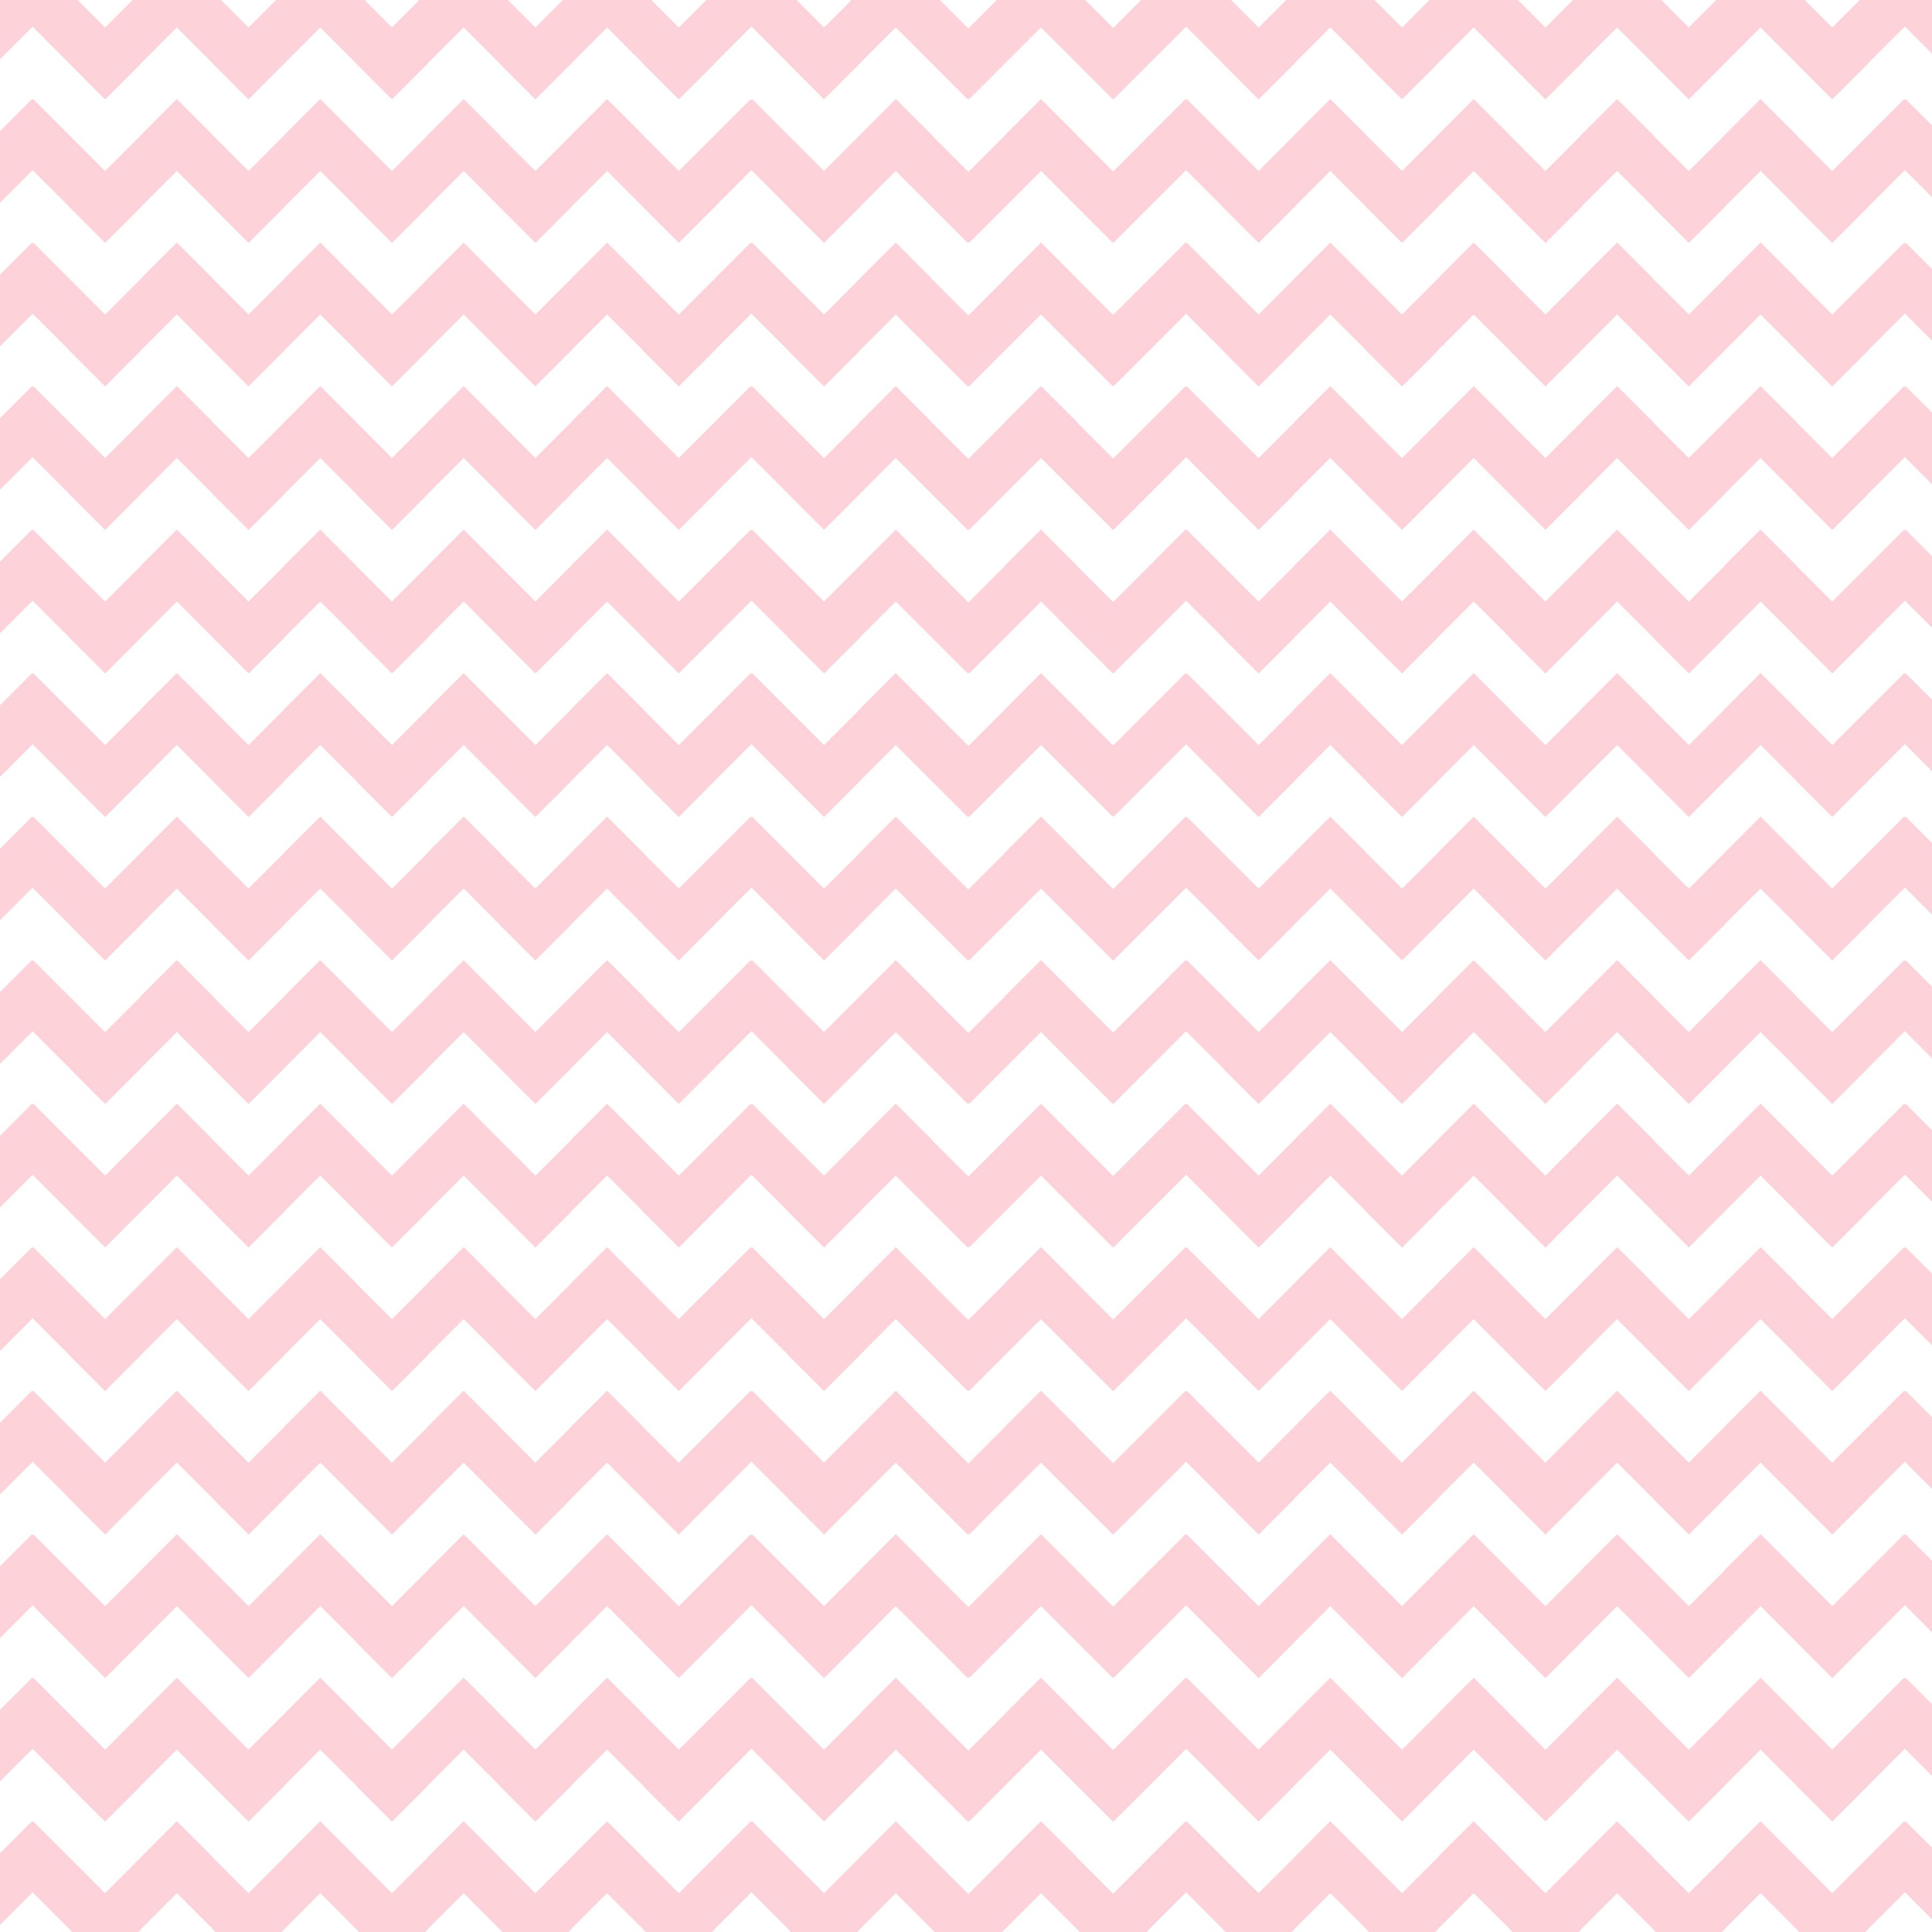 Pink and White Chevron 3600x3600